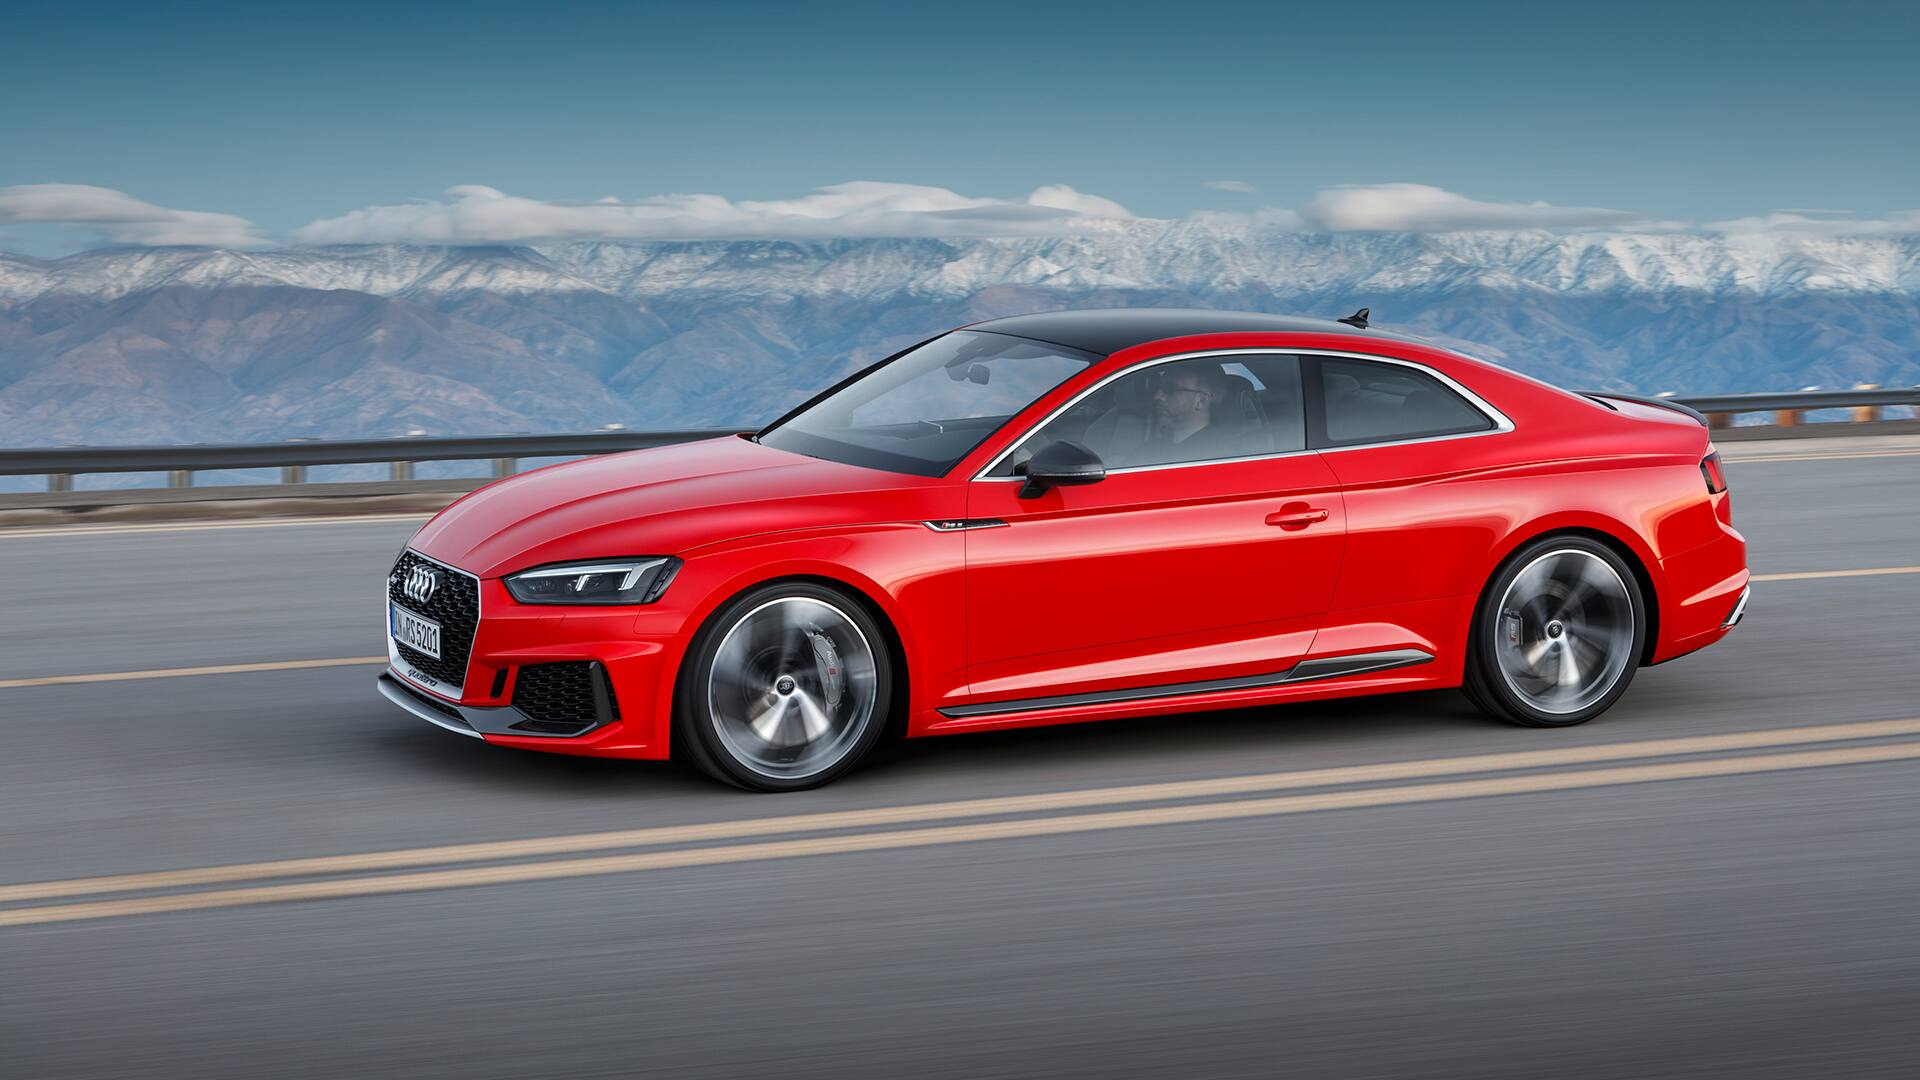 Audi Rs5 Canada Price >> 2018 RS 5 Coupé > Audi Canada